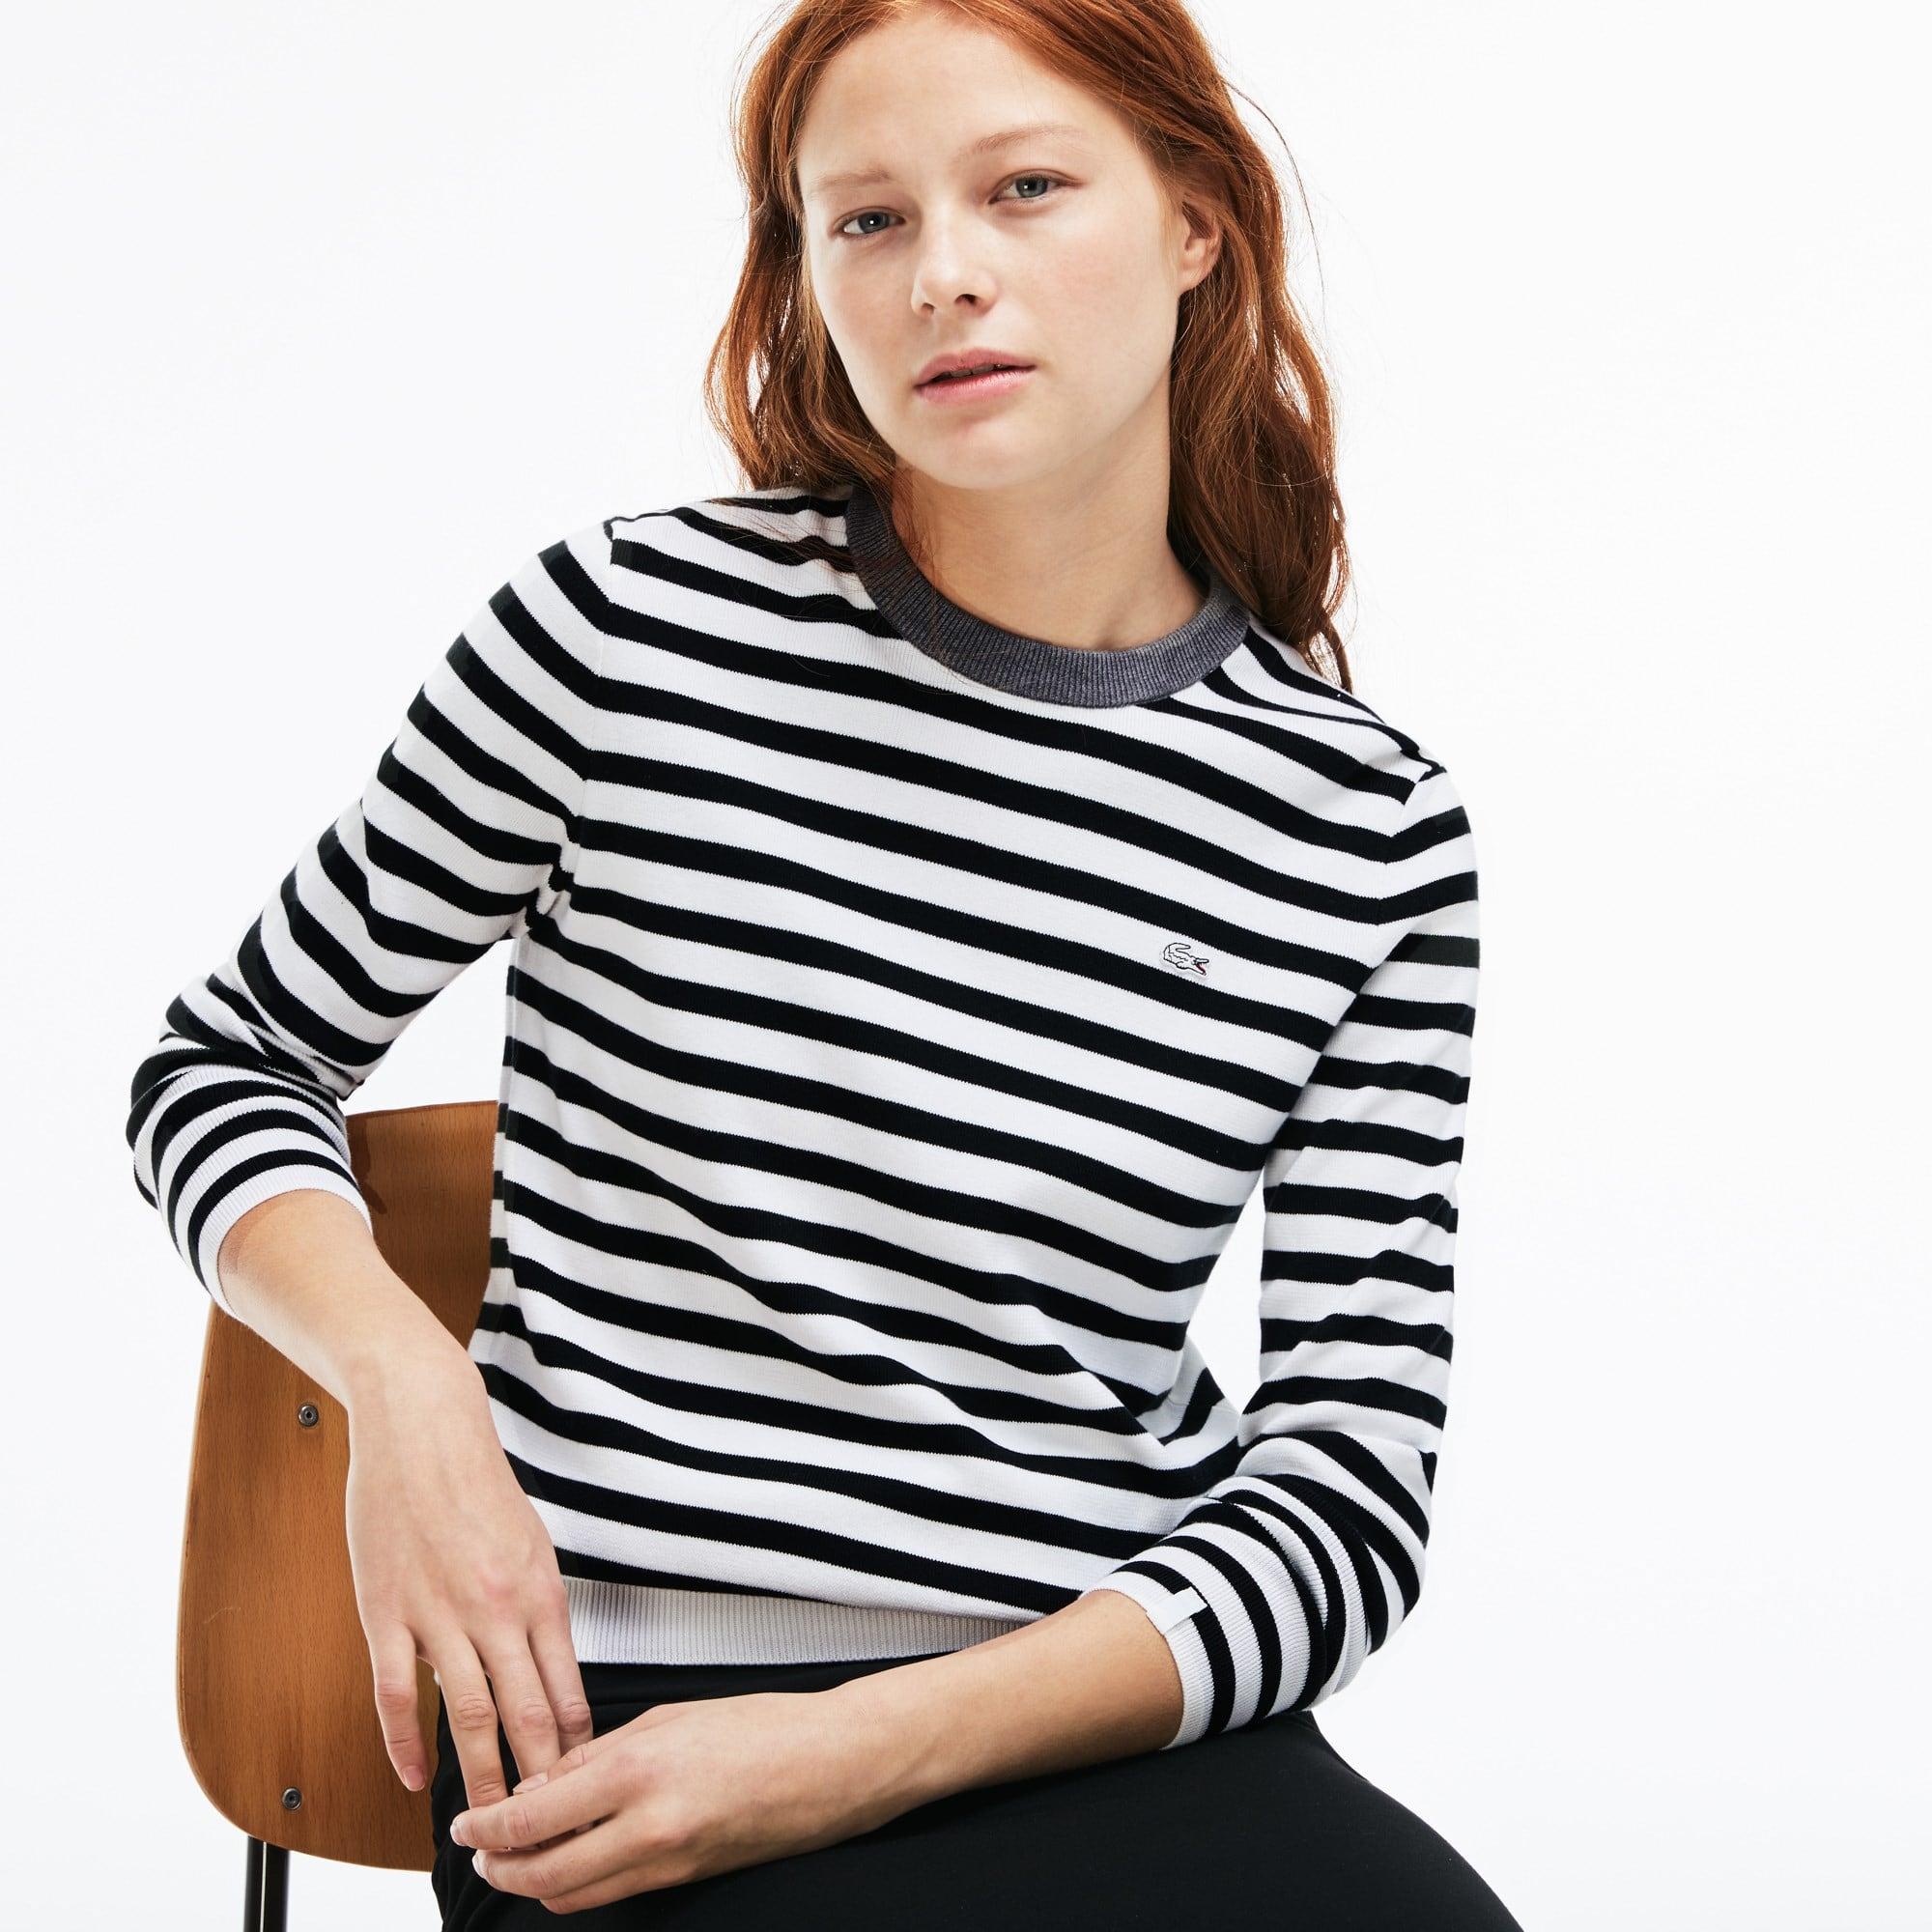 Women's Lacoste LIVE Crew Neck Striped Cotton Jersey Sweater